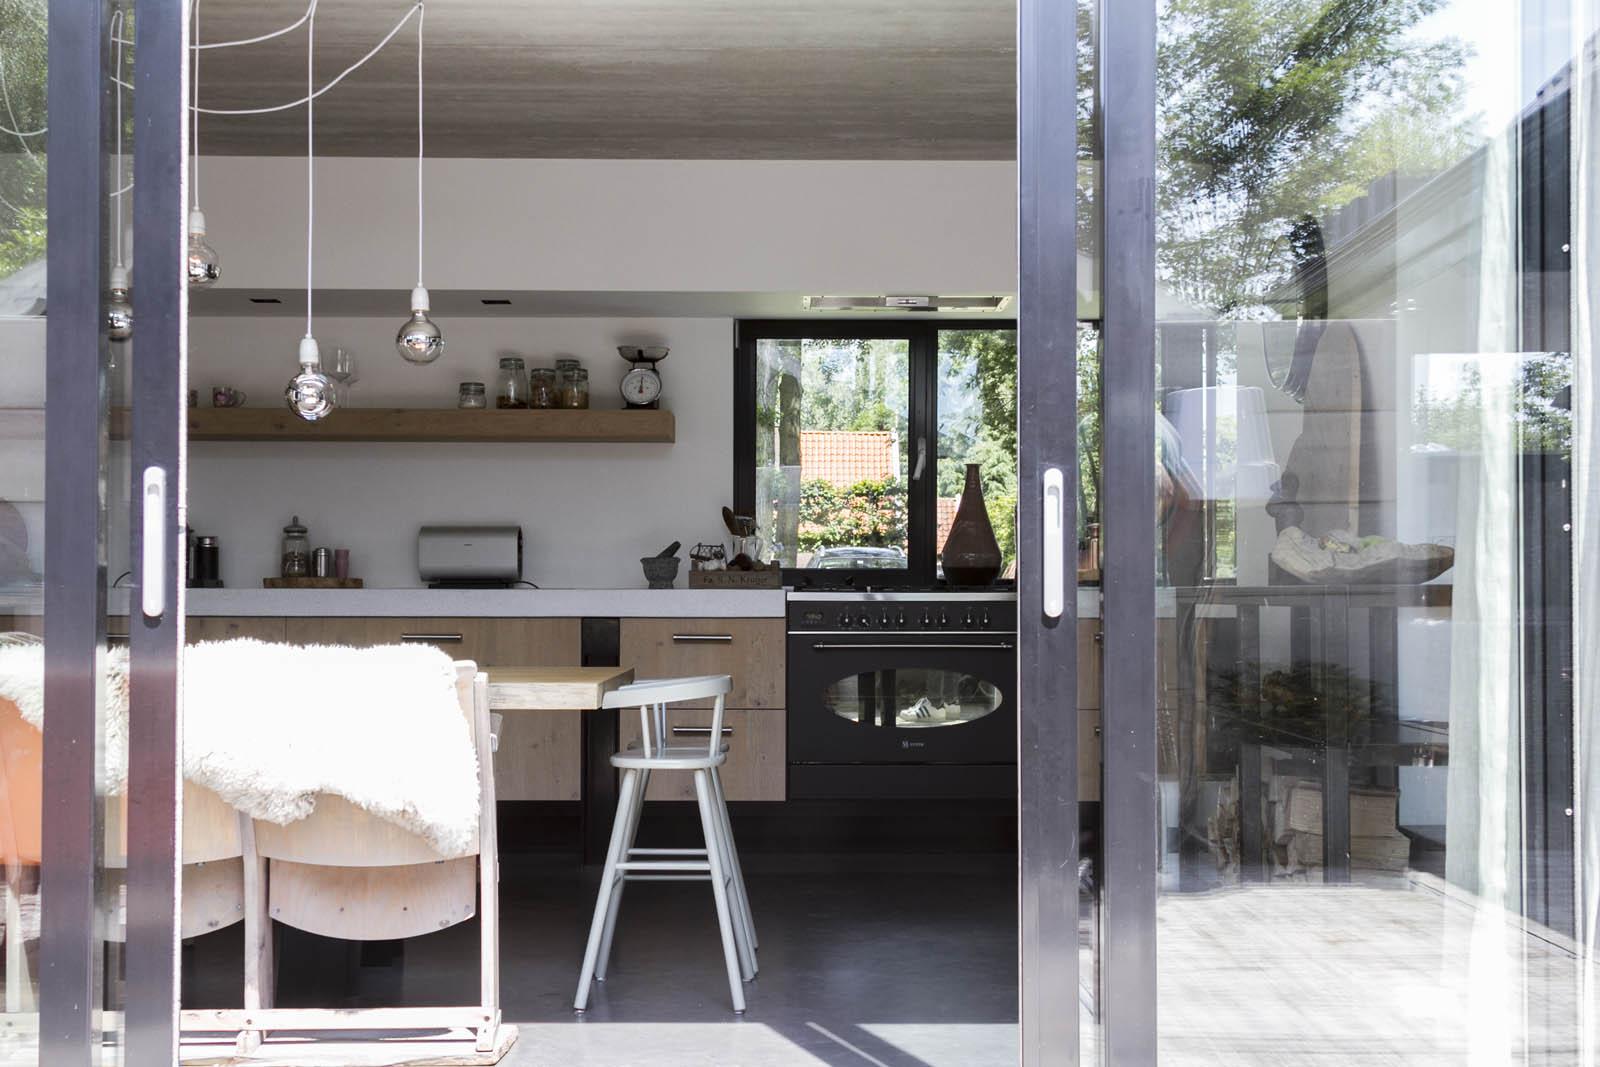 kitchen, listed building construction,Alkmaar, jeroen de nijs